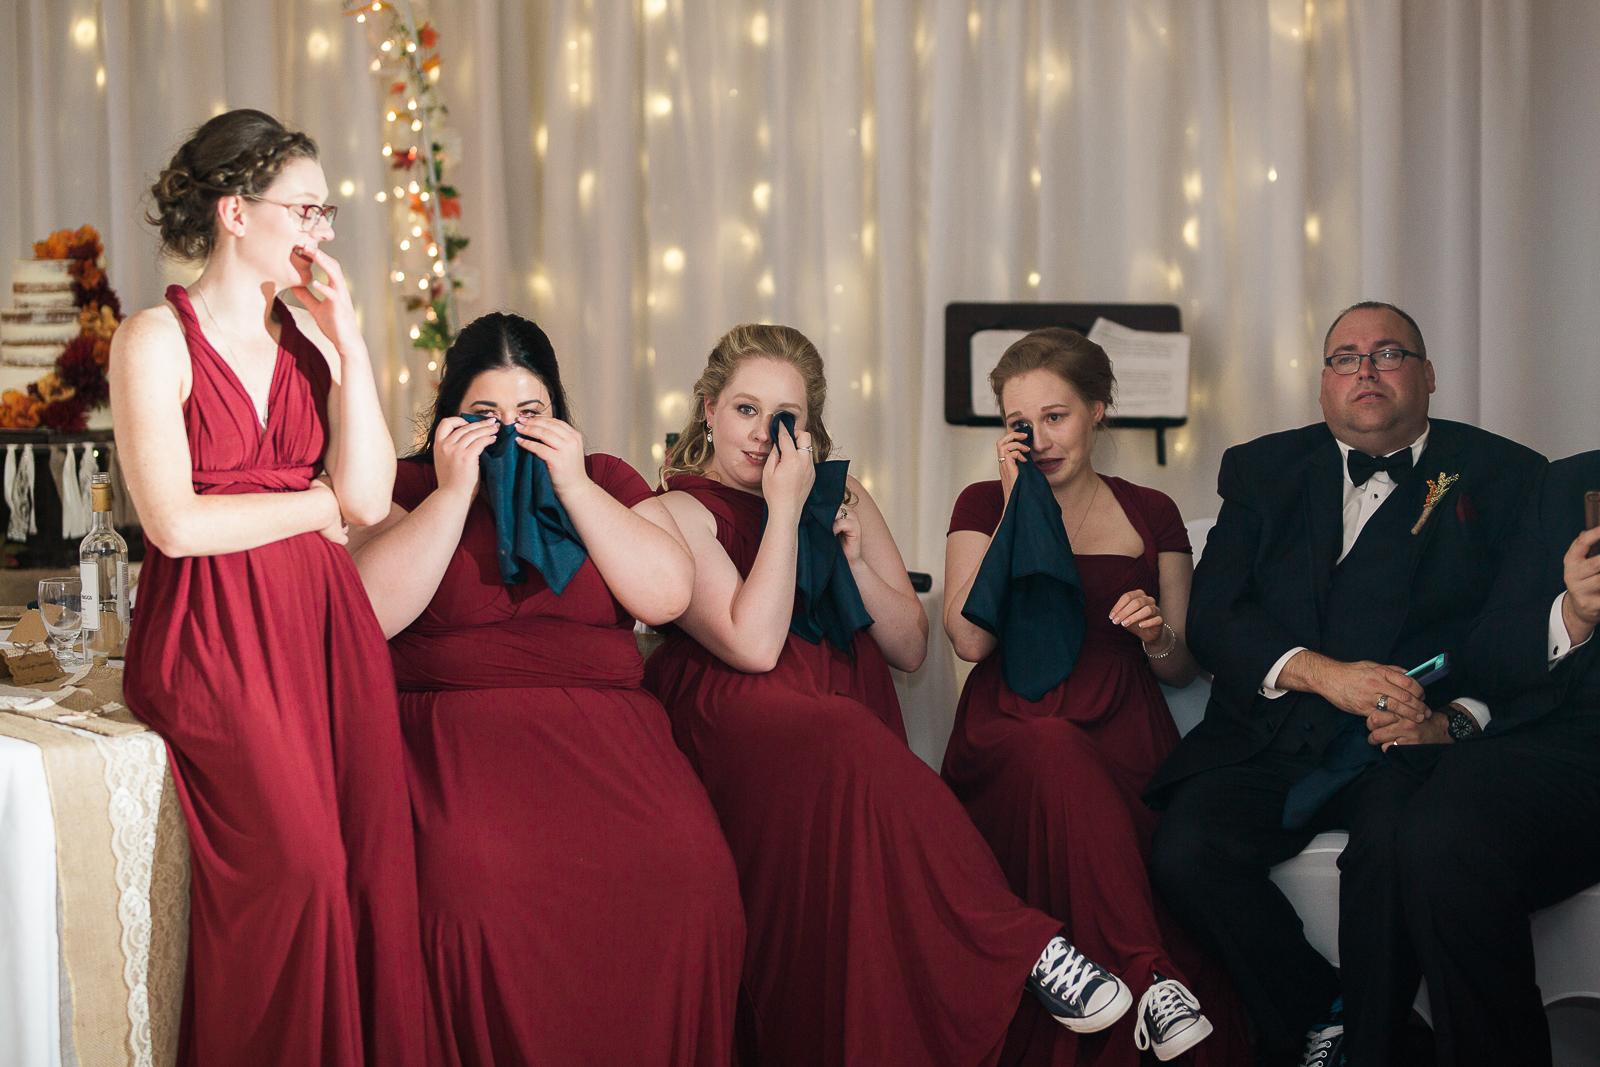 gander-wedding-photographer-151.jpg